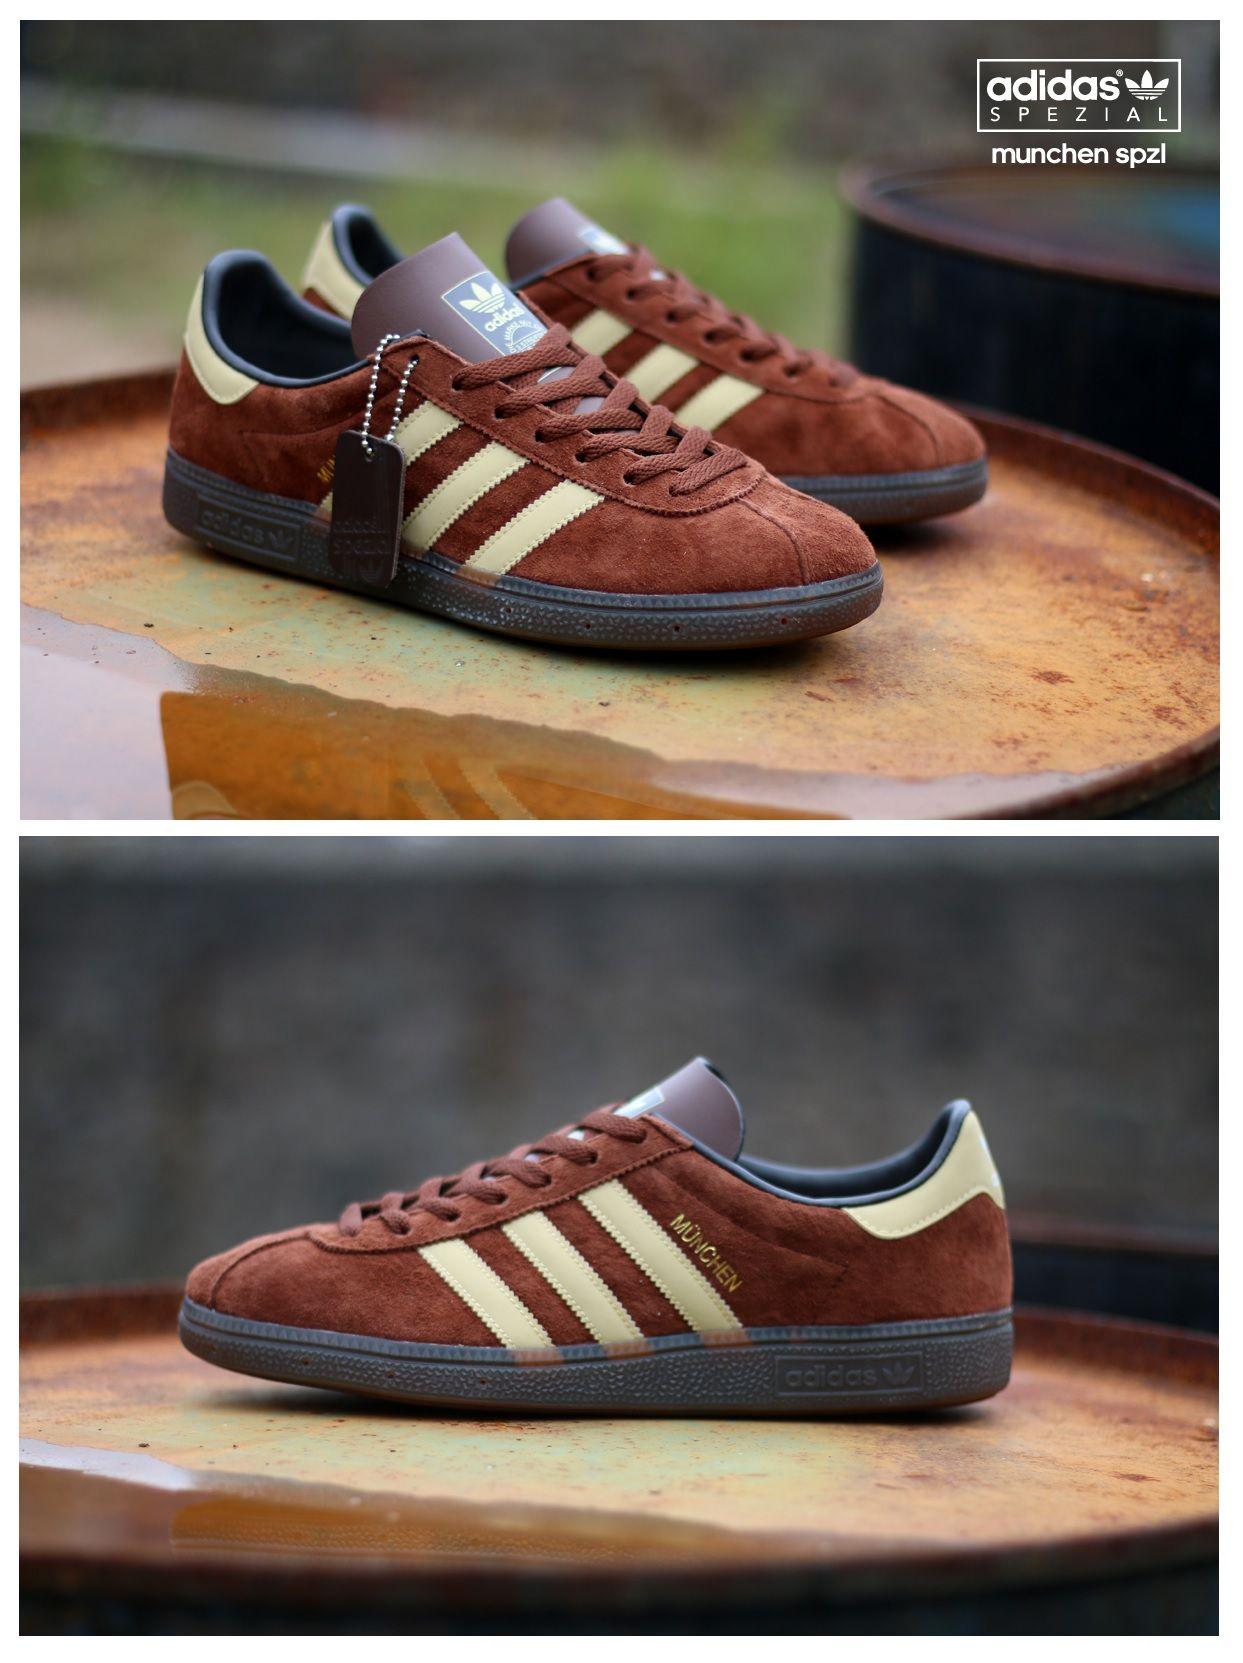 best sell pretty cheap free shipping adidas Originals Munchen SPZL | Adidas models, Adidas ...